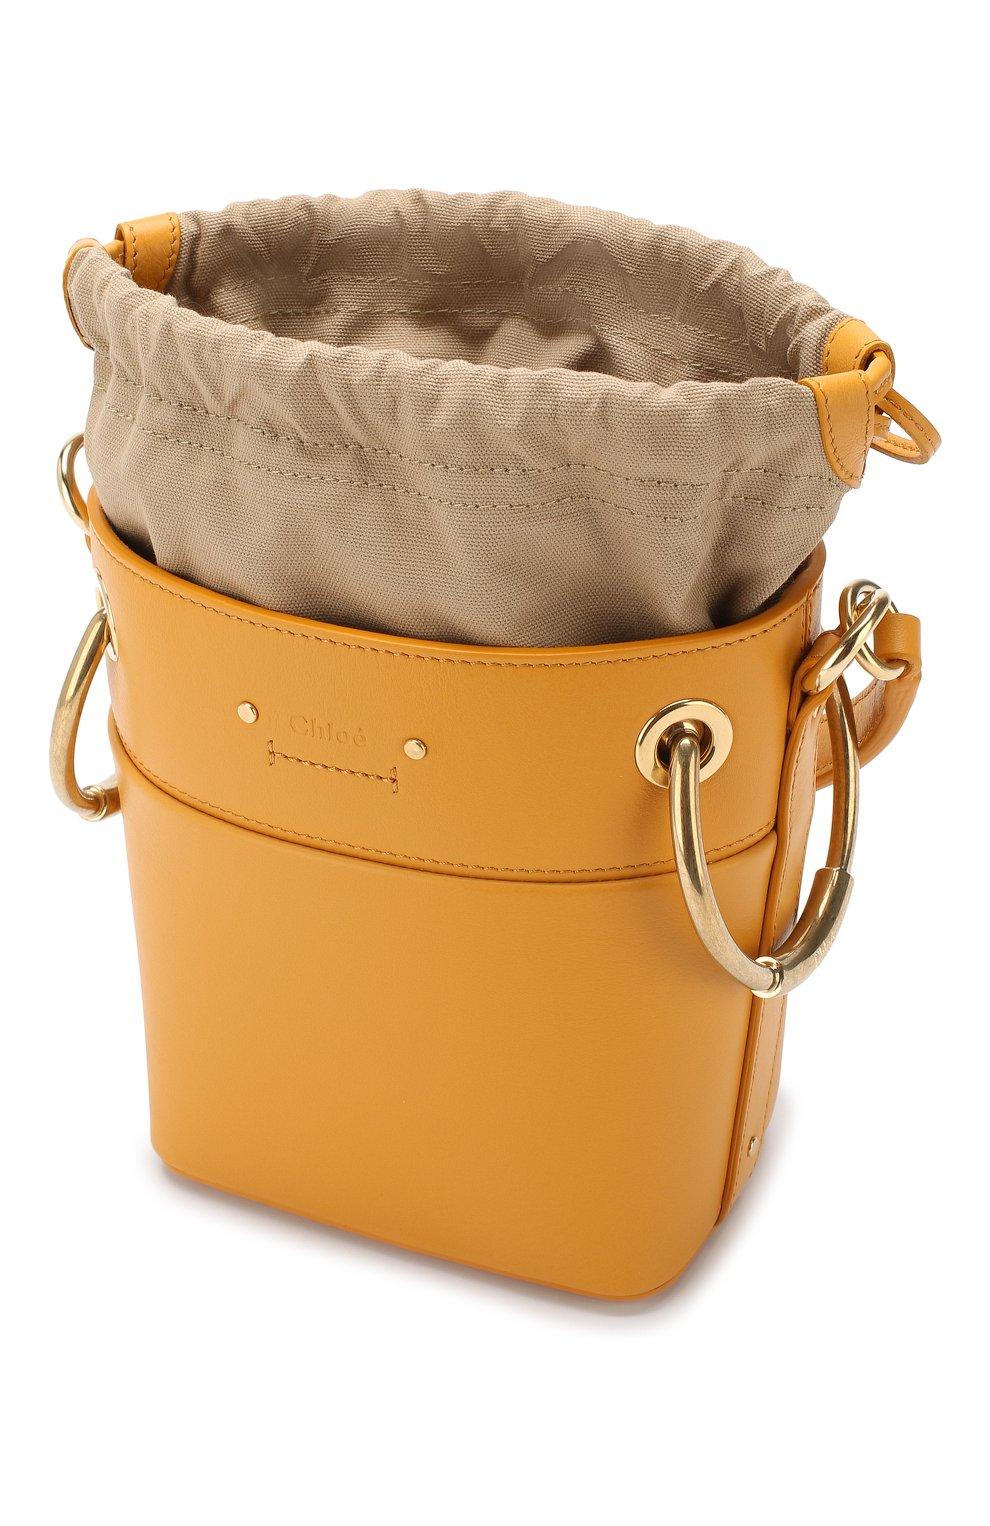 Сумка Roy Bucket mini Chloé желтая цвета | Фото №4